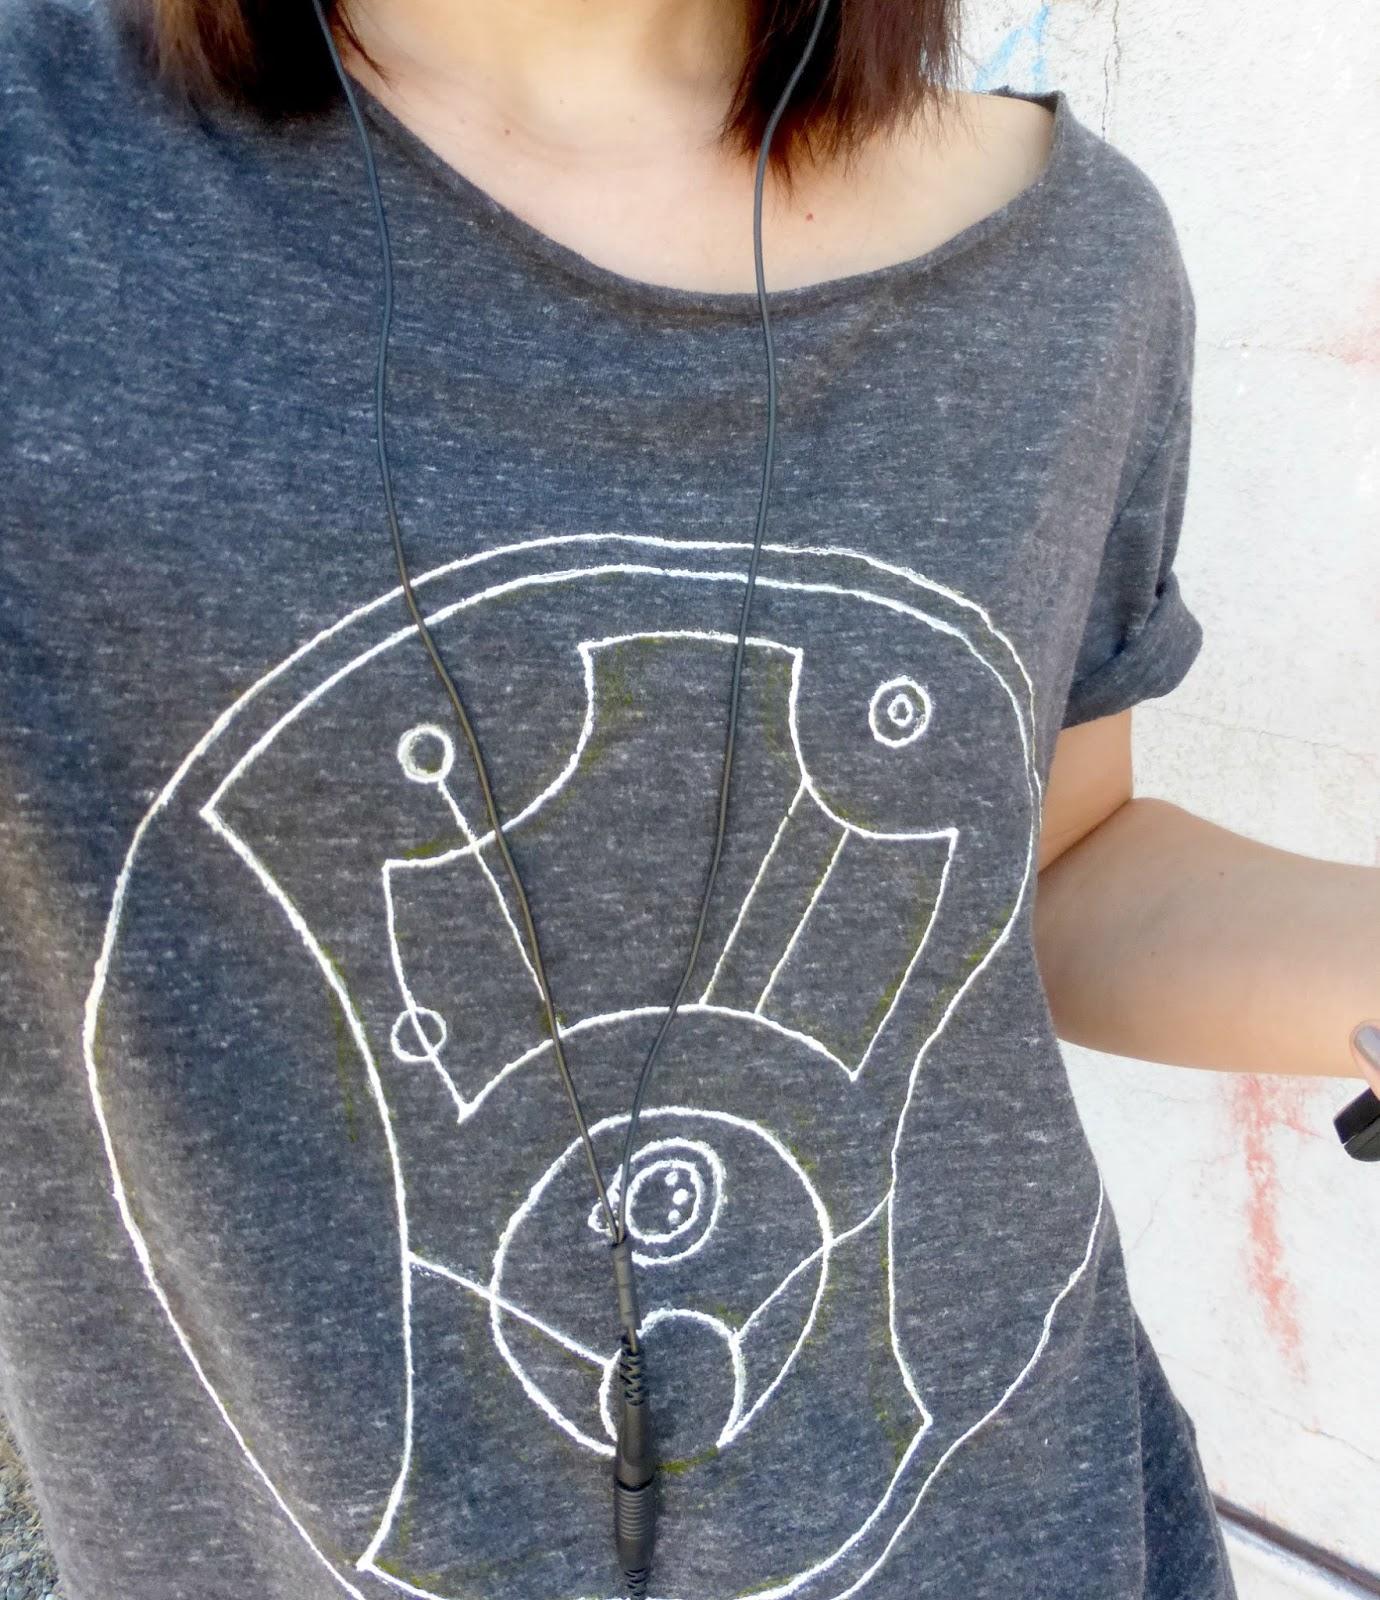 diy doctor who shirt hello sweetie in circular gallifreyan